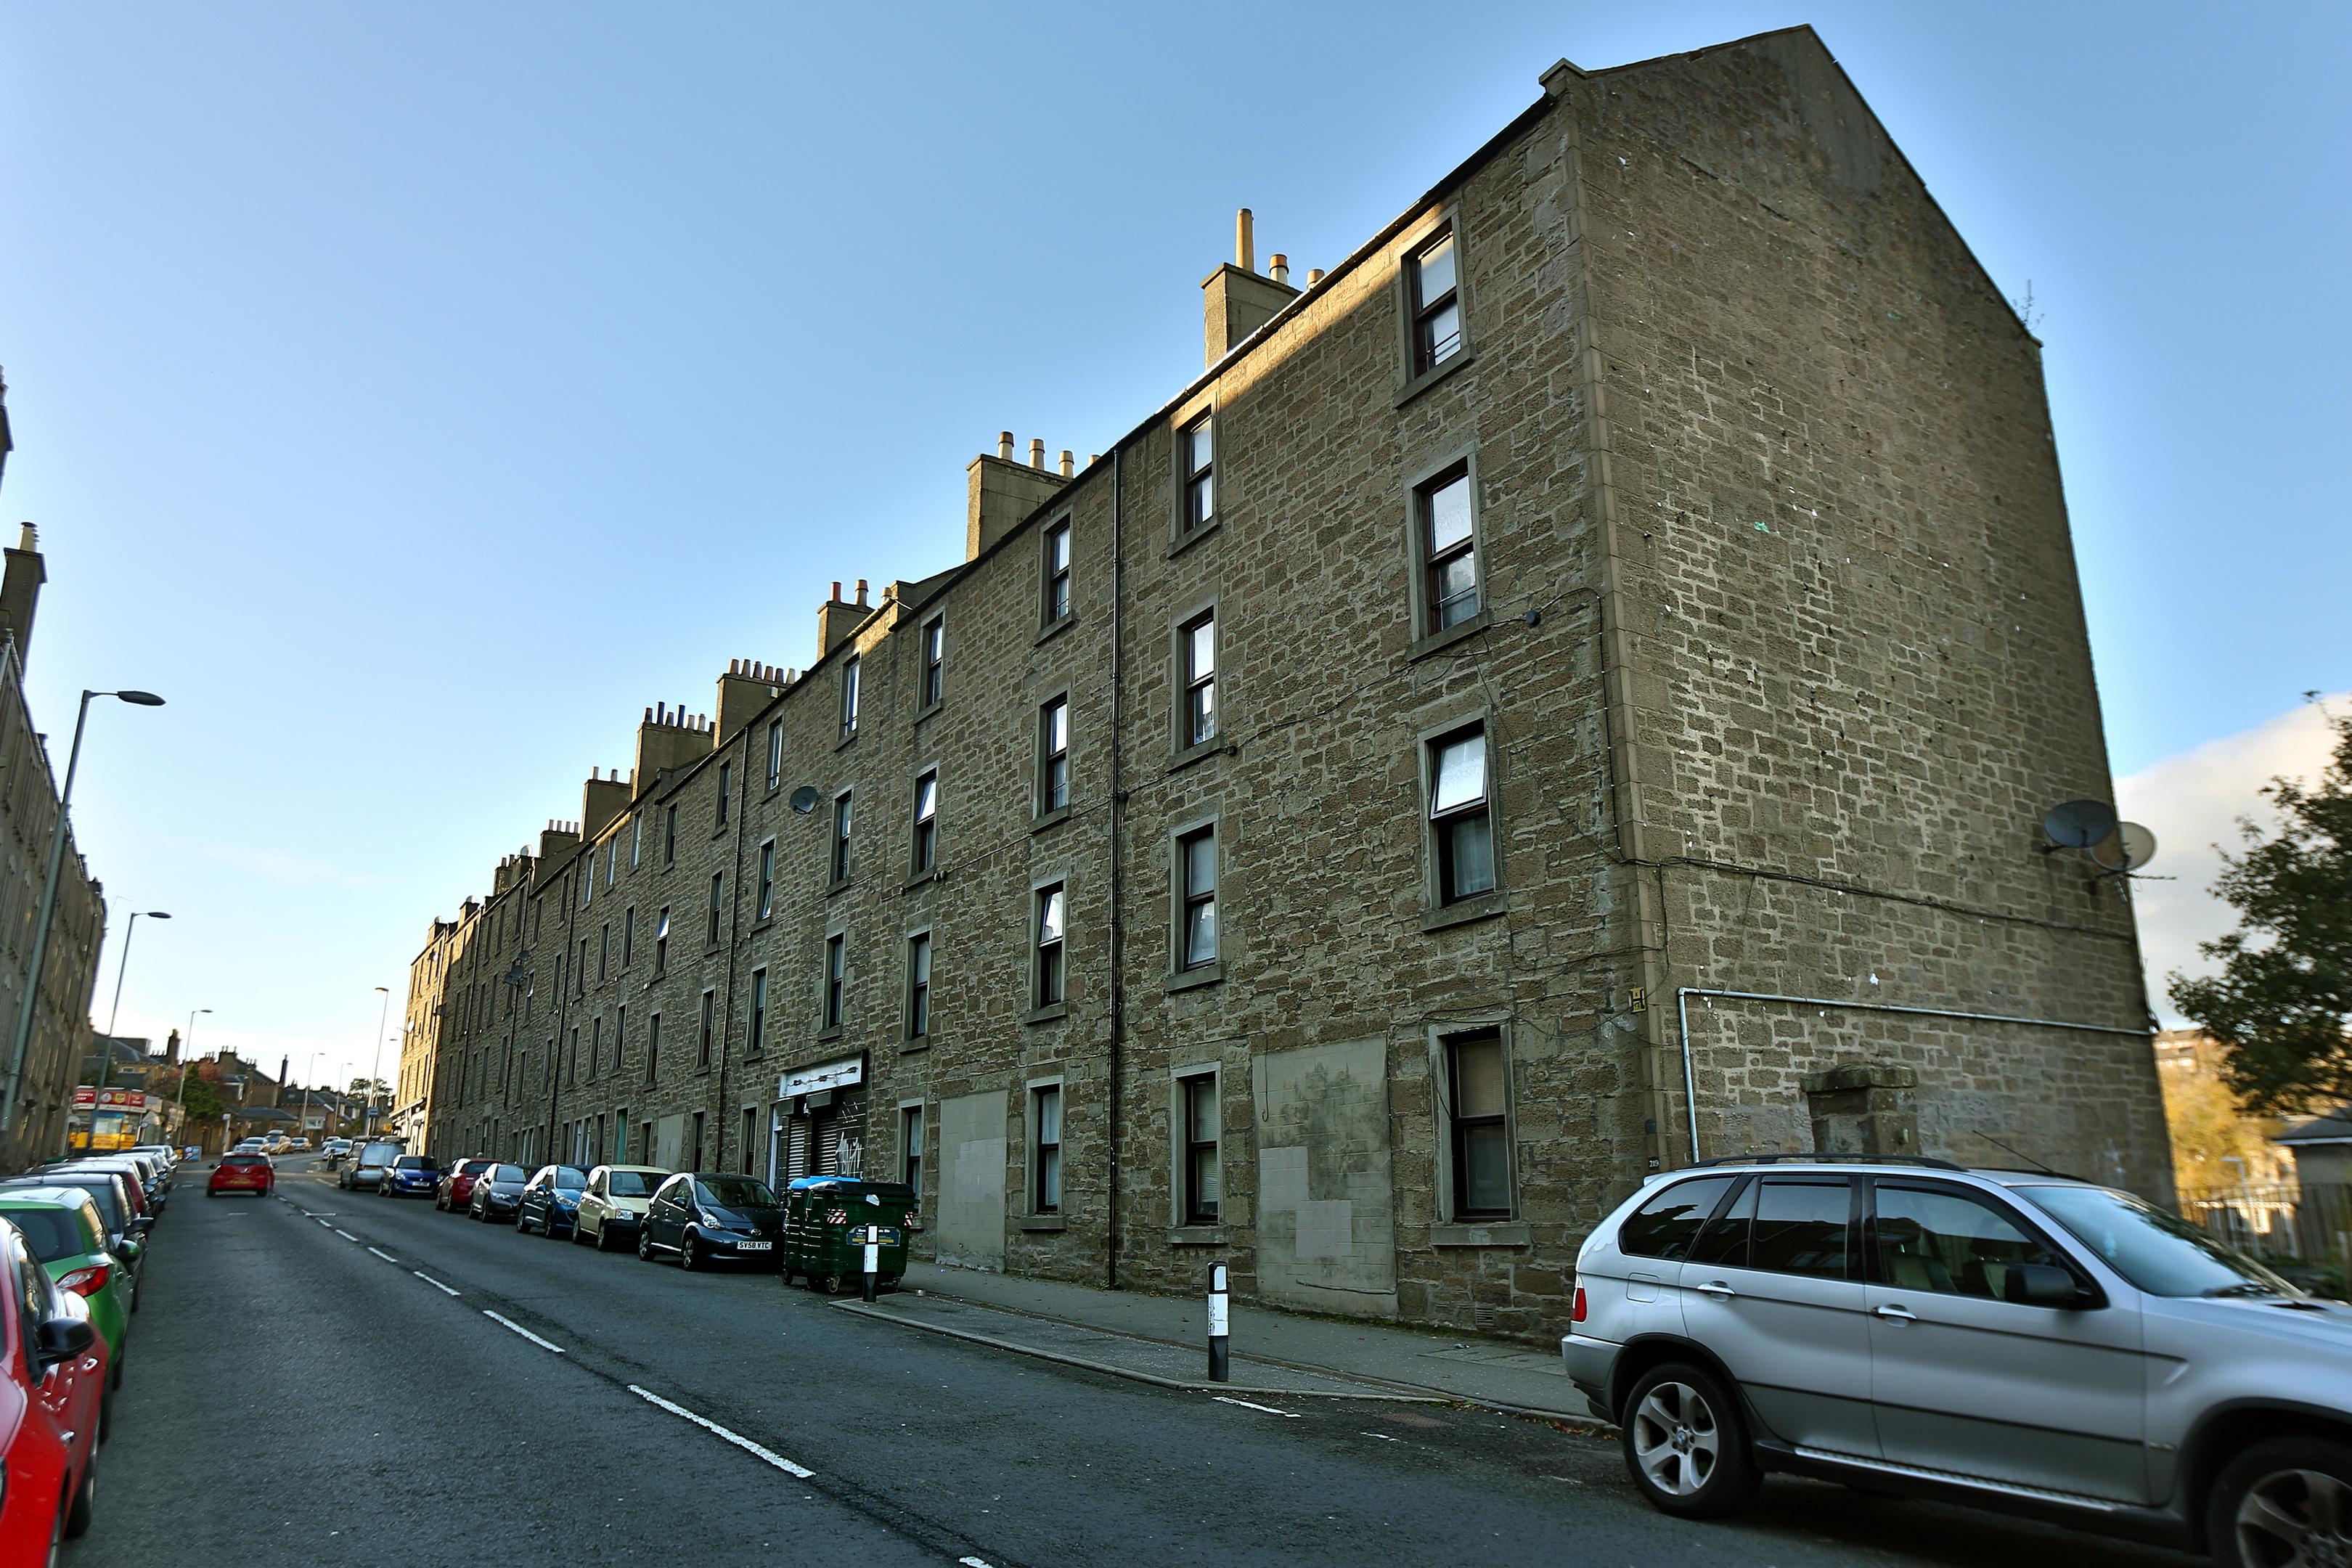 The flats on Blackness Road.